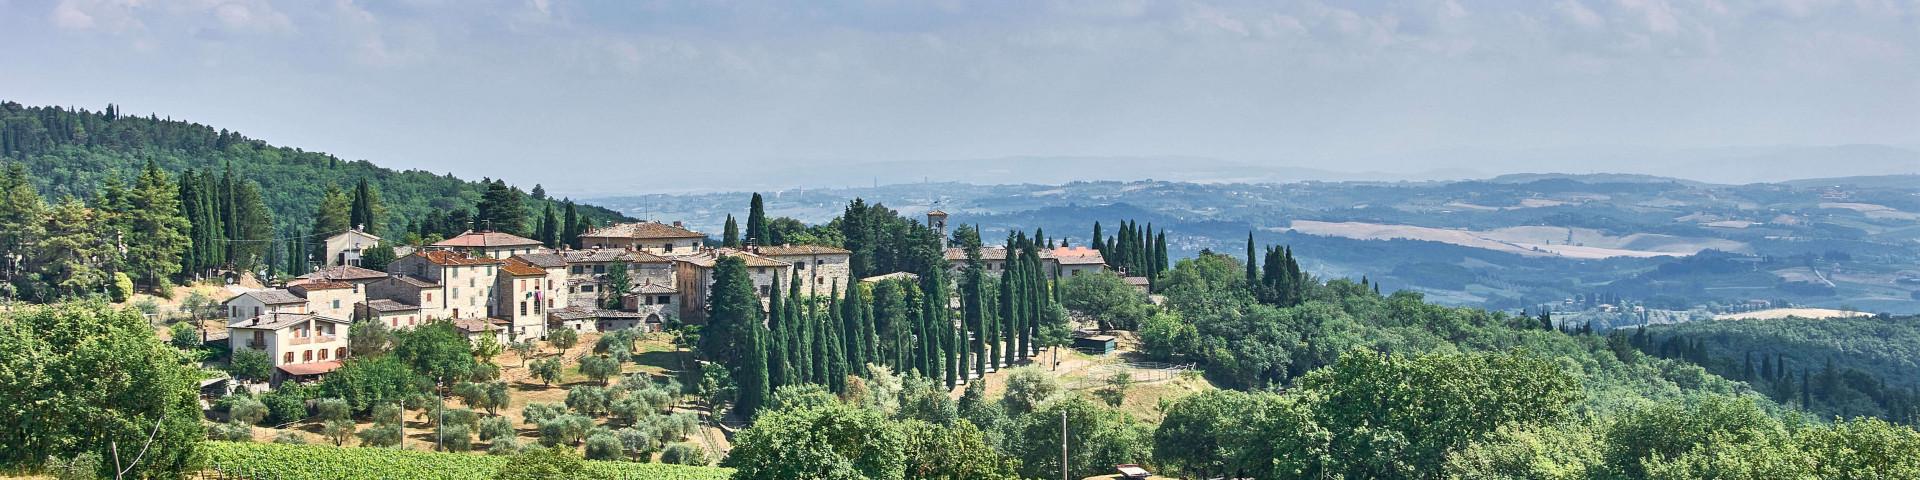 Chianti countryside, Tuscany summer itinerary